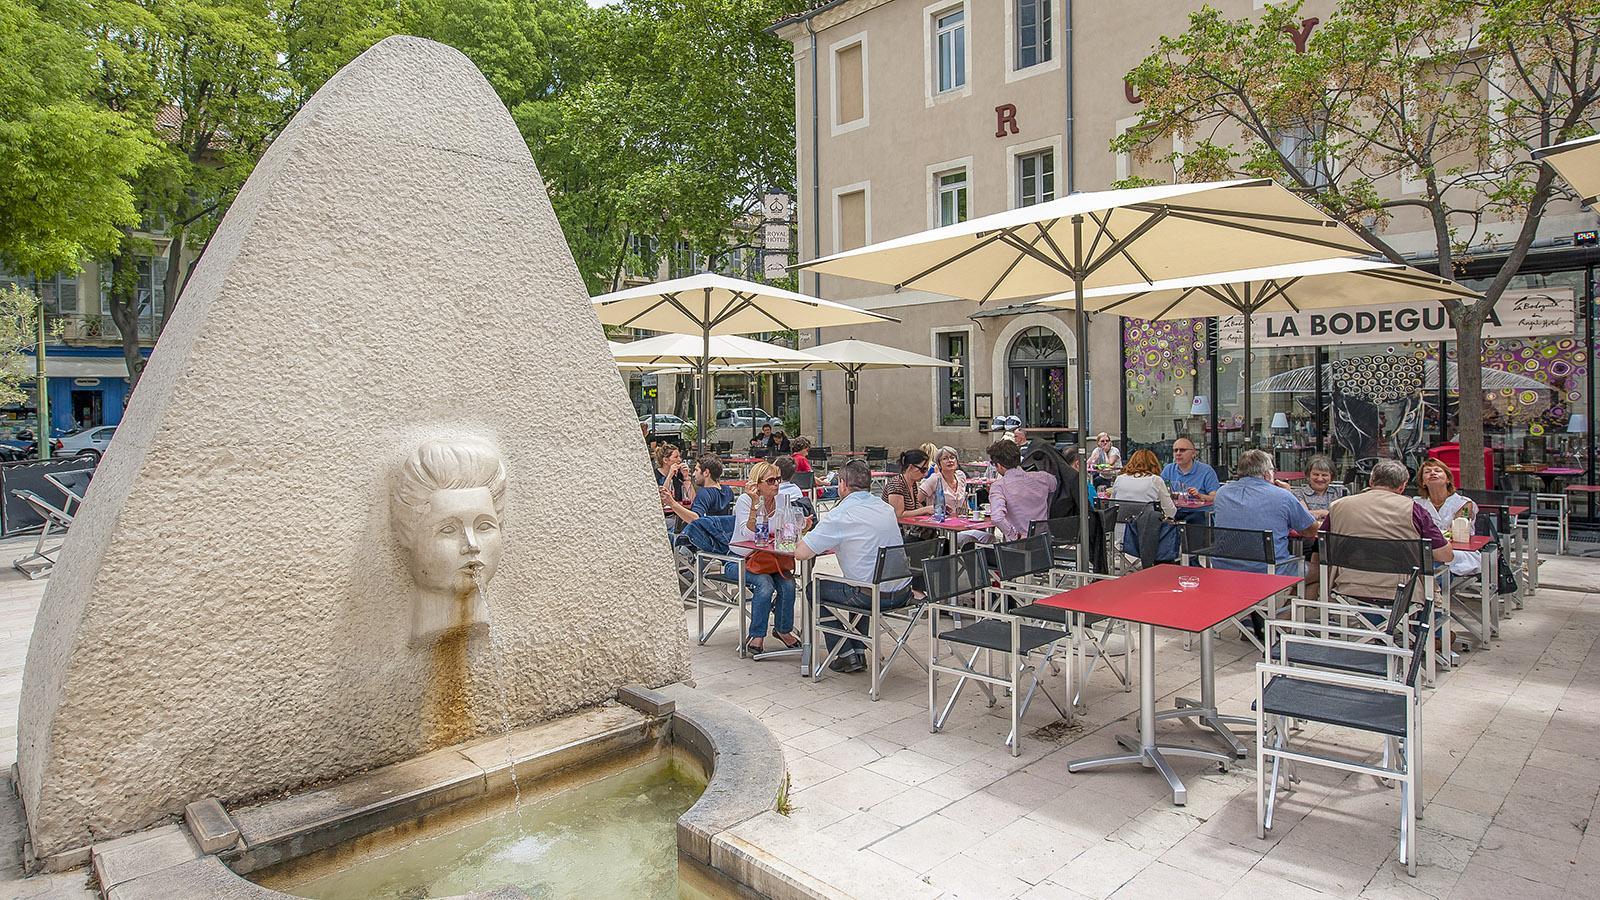 Der Beginn der Place d'Assas am Boulevard und dem dortigen Hôtel Royal. Foto: Hilke Maunder